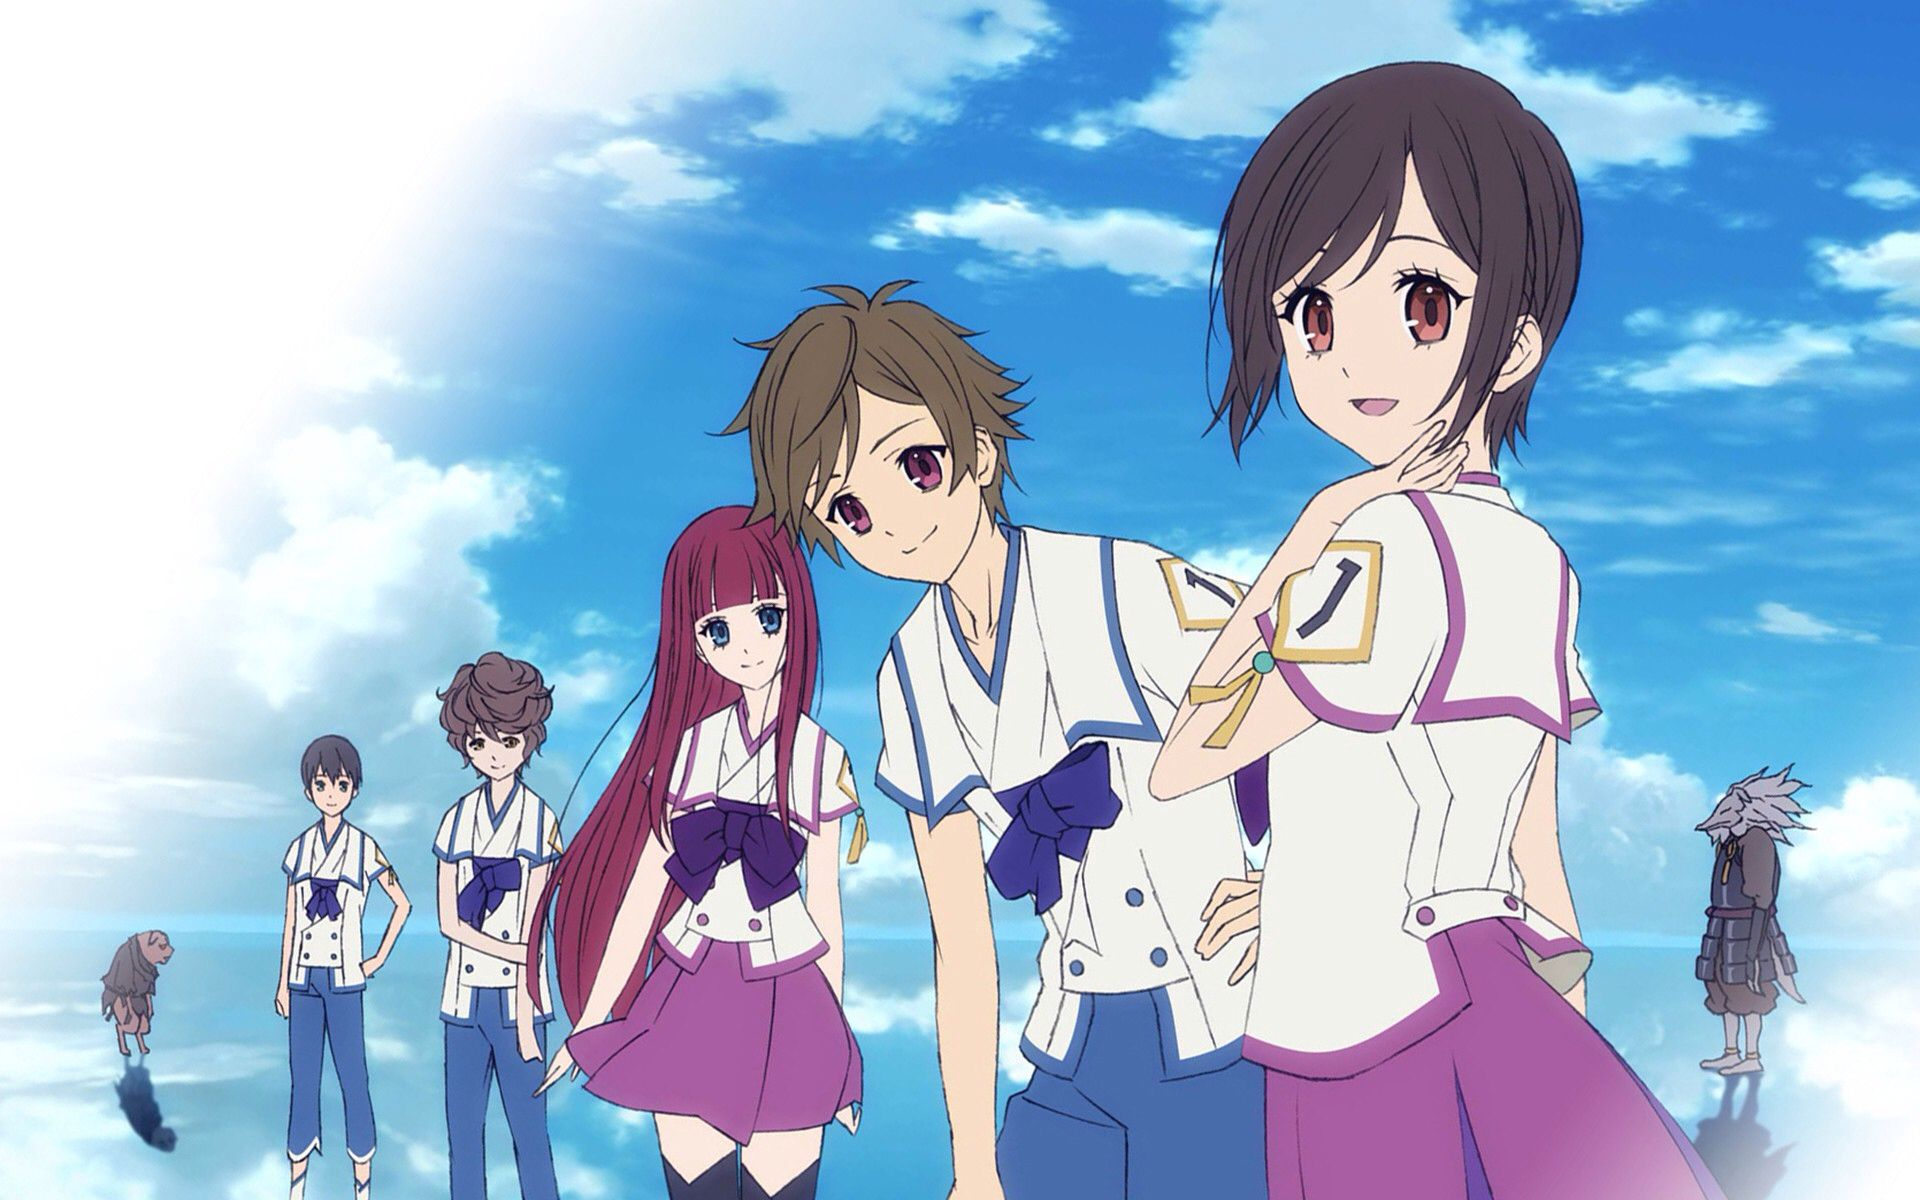 Pin by becky murga on zoetrope anime good anime series